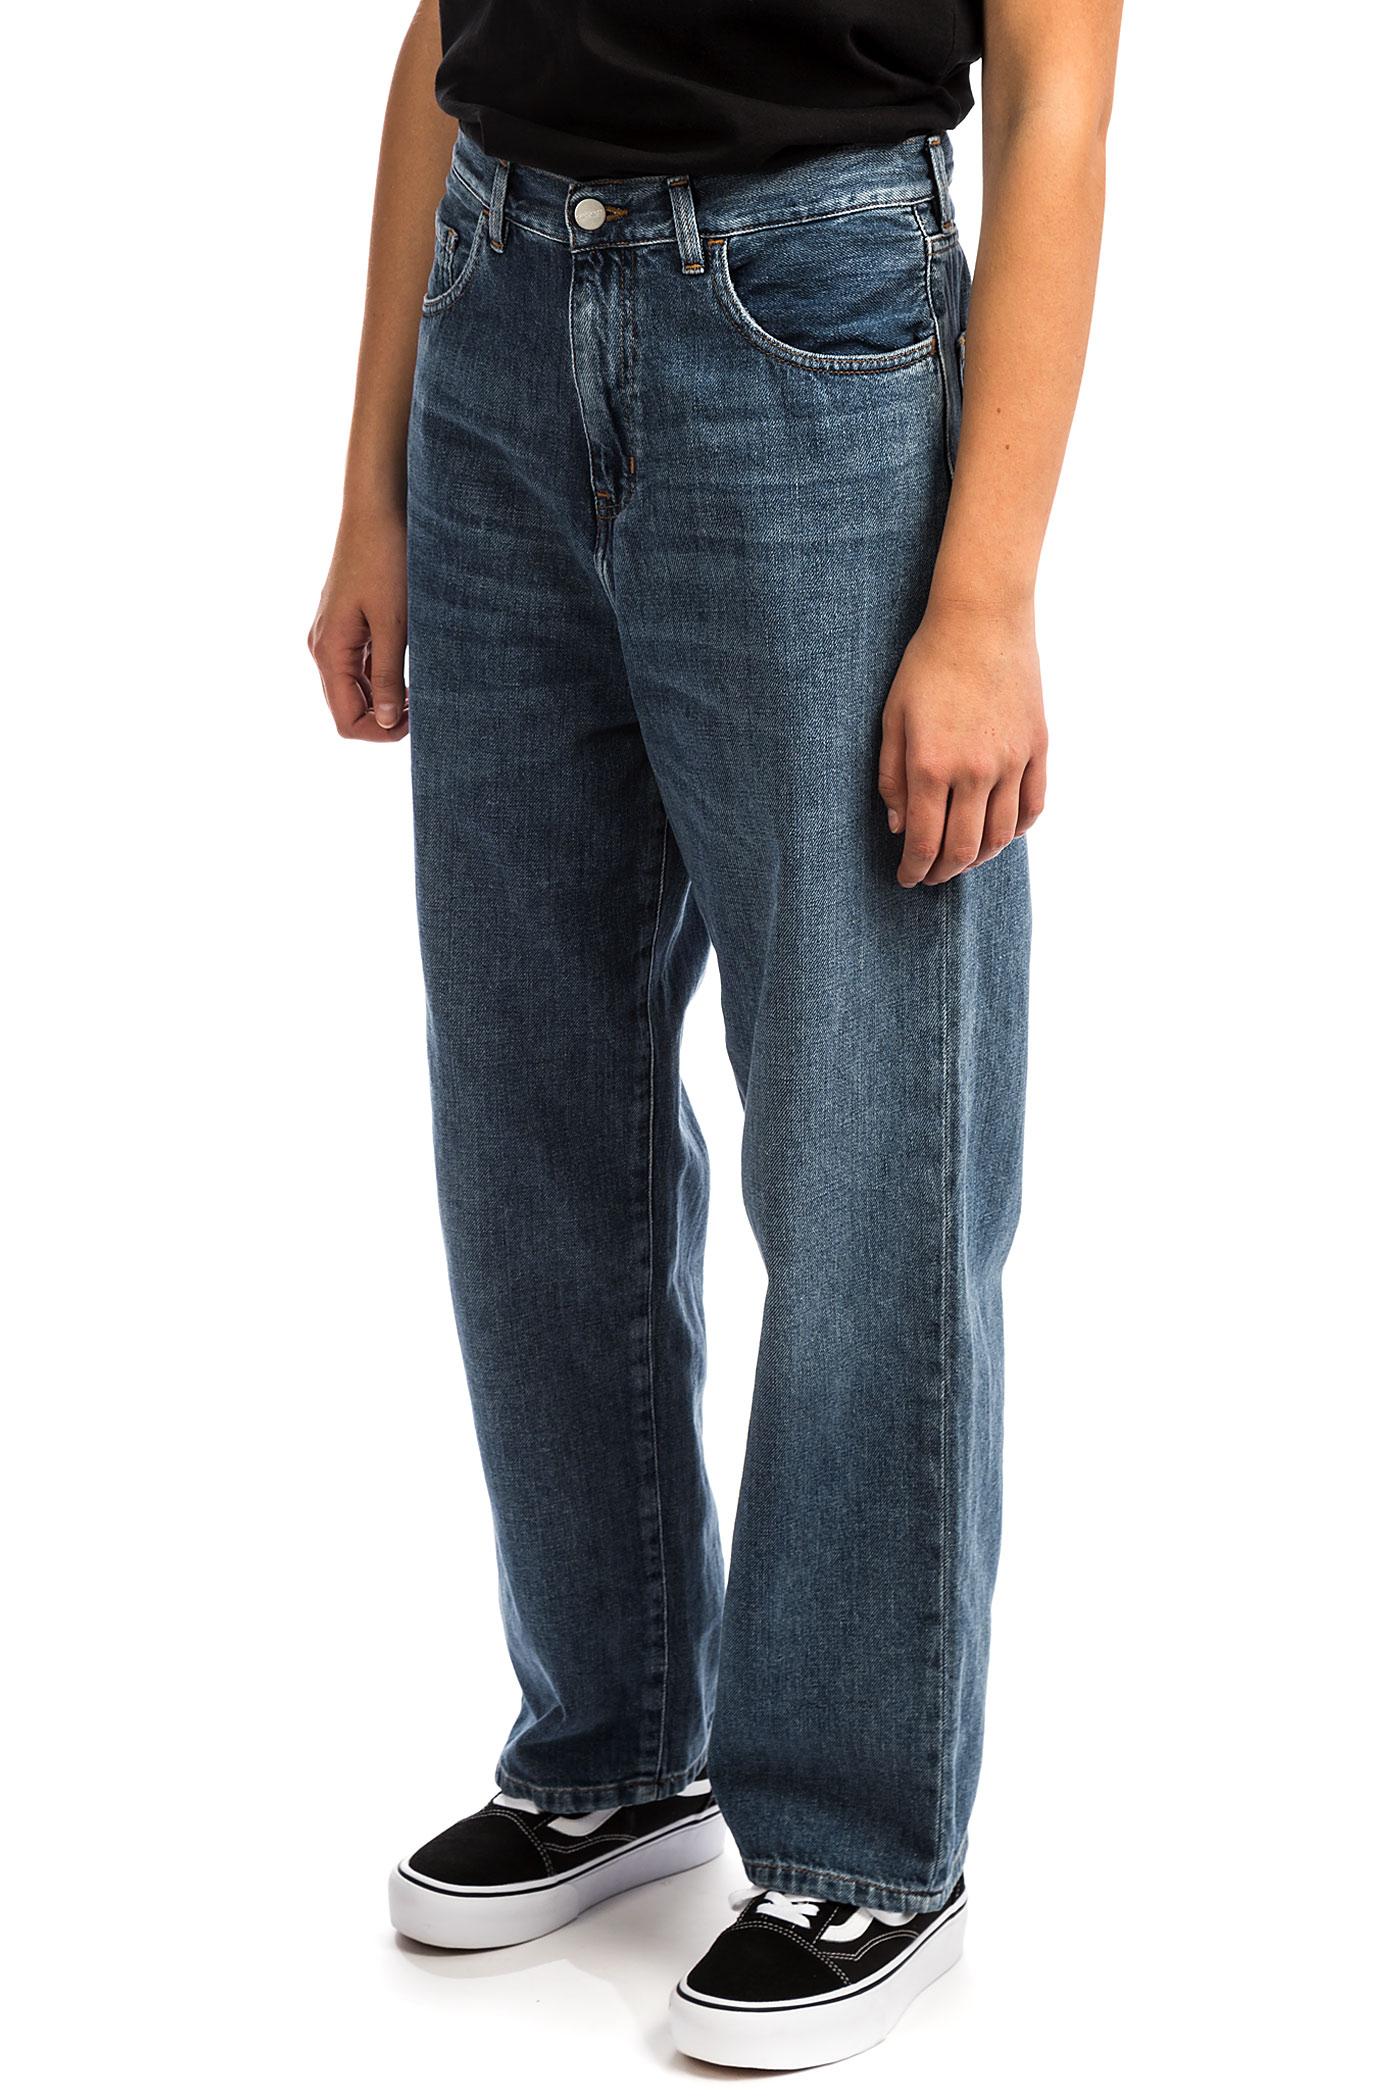 Jeans Pant Dark Carhartt Washed Womenblue Wip Newport Stone W' Jay 5SL4Rq3Acj